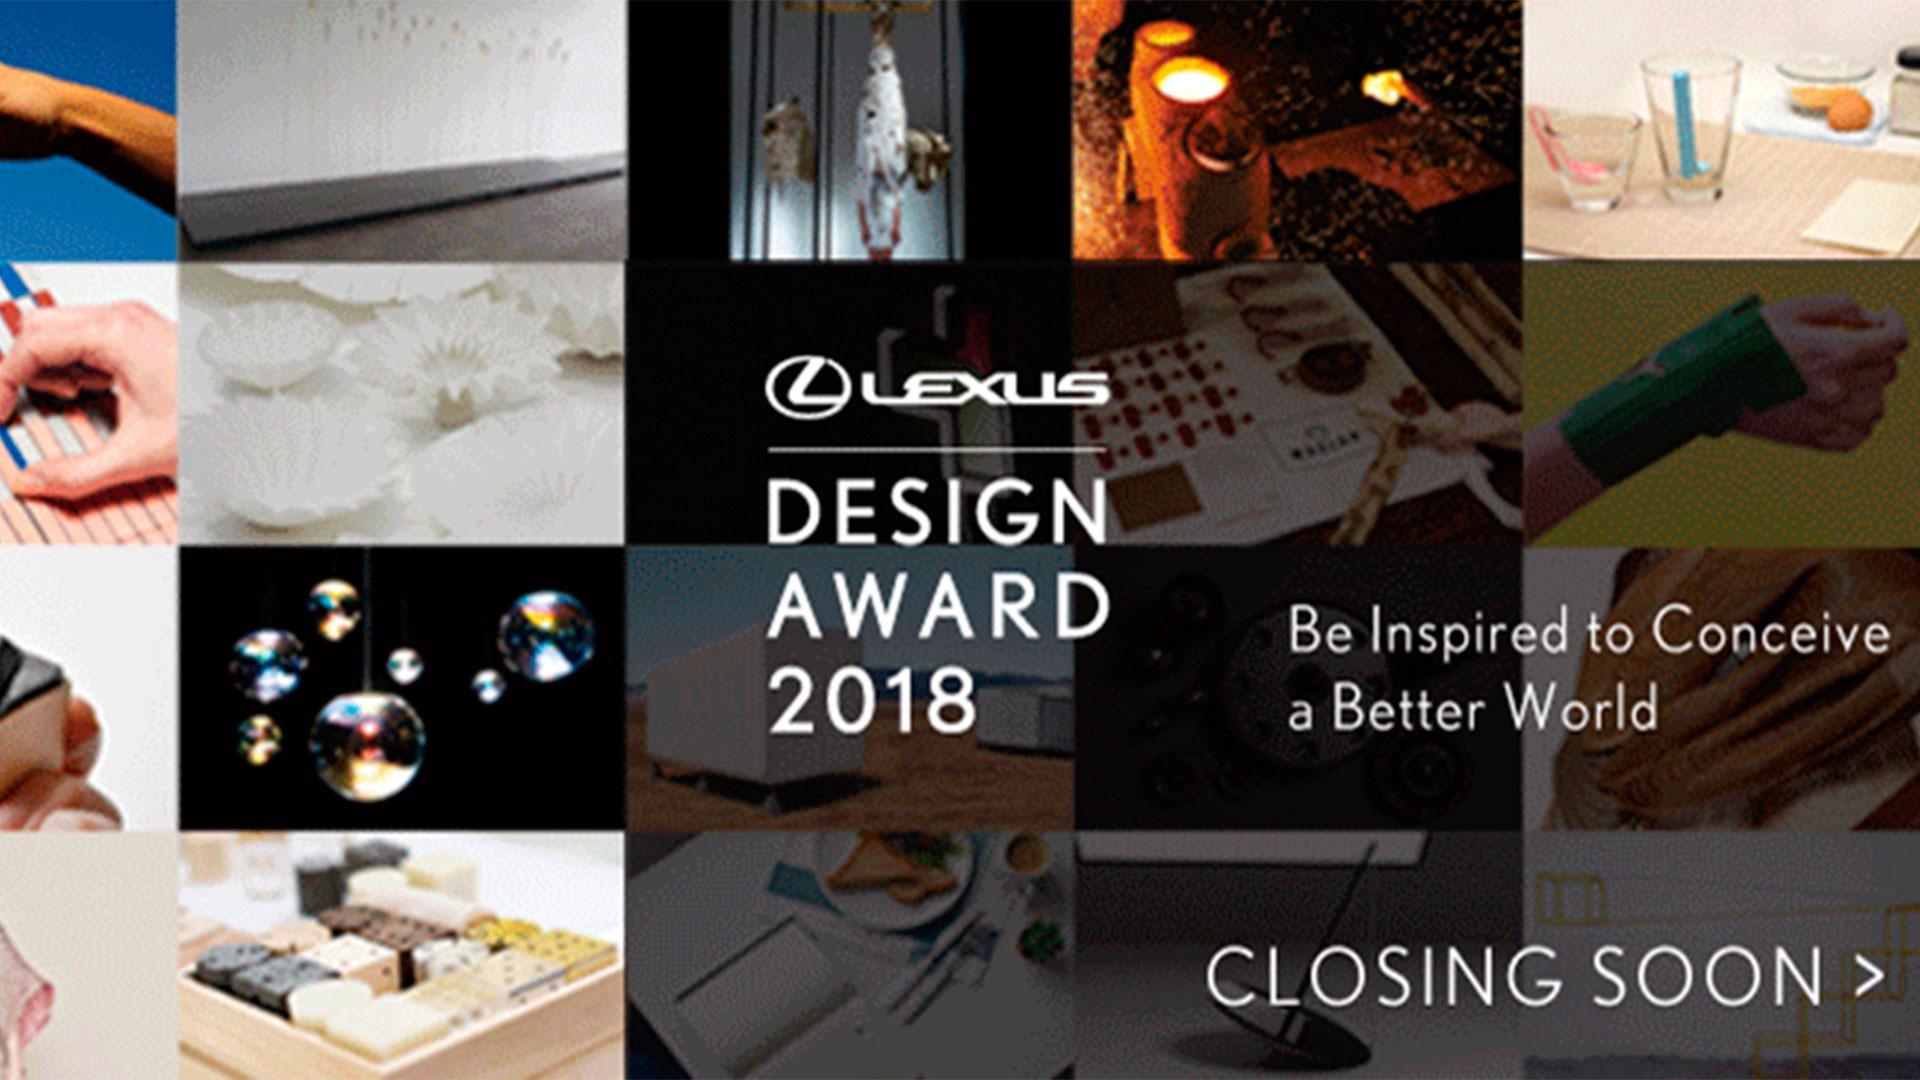 Inspiracion Co Lexus Design Award 2018 Lexus Espana